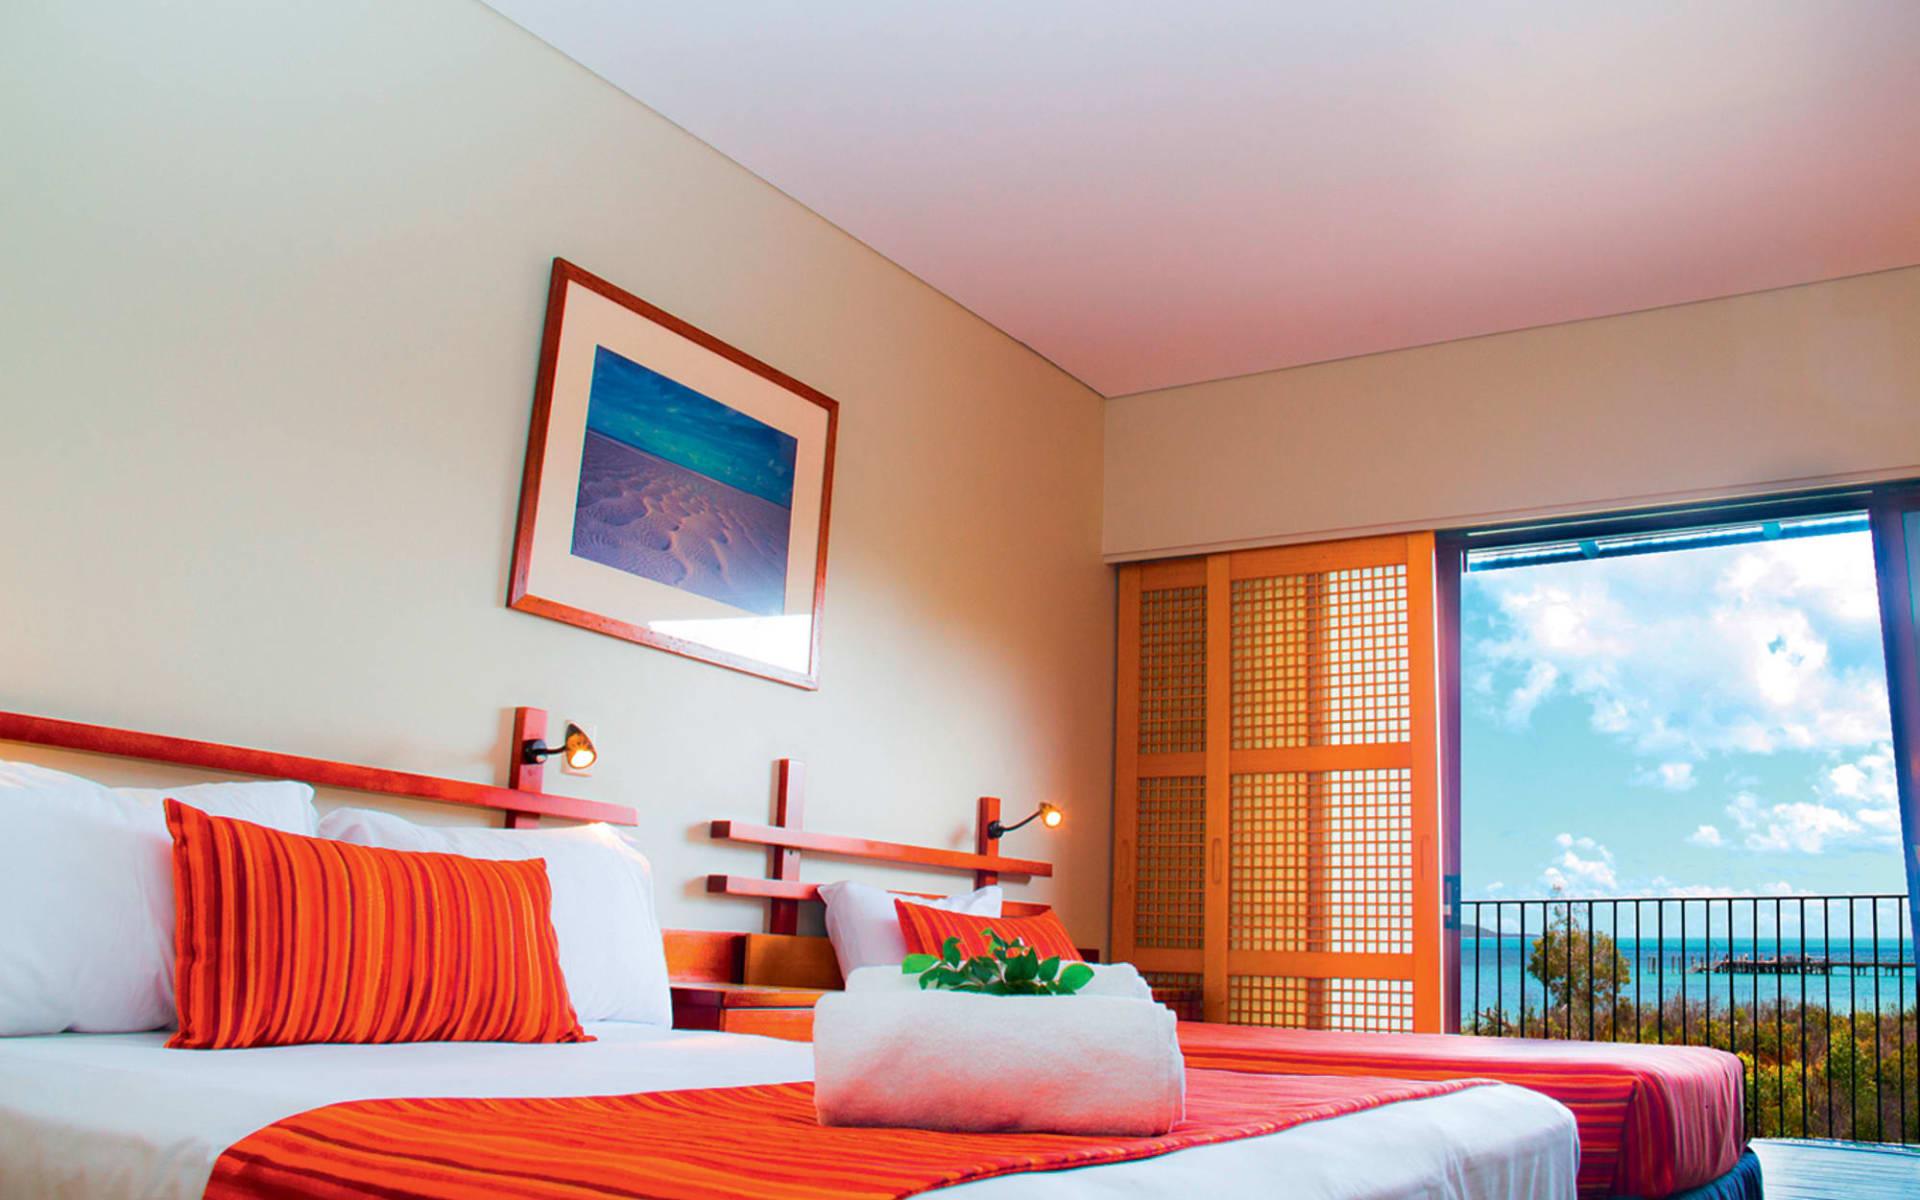 Kingfisher Bay Resort in Fraser Island:  Kingfisher Bay Resort - Bay View Room